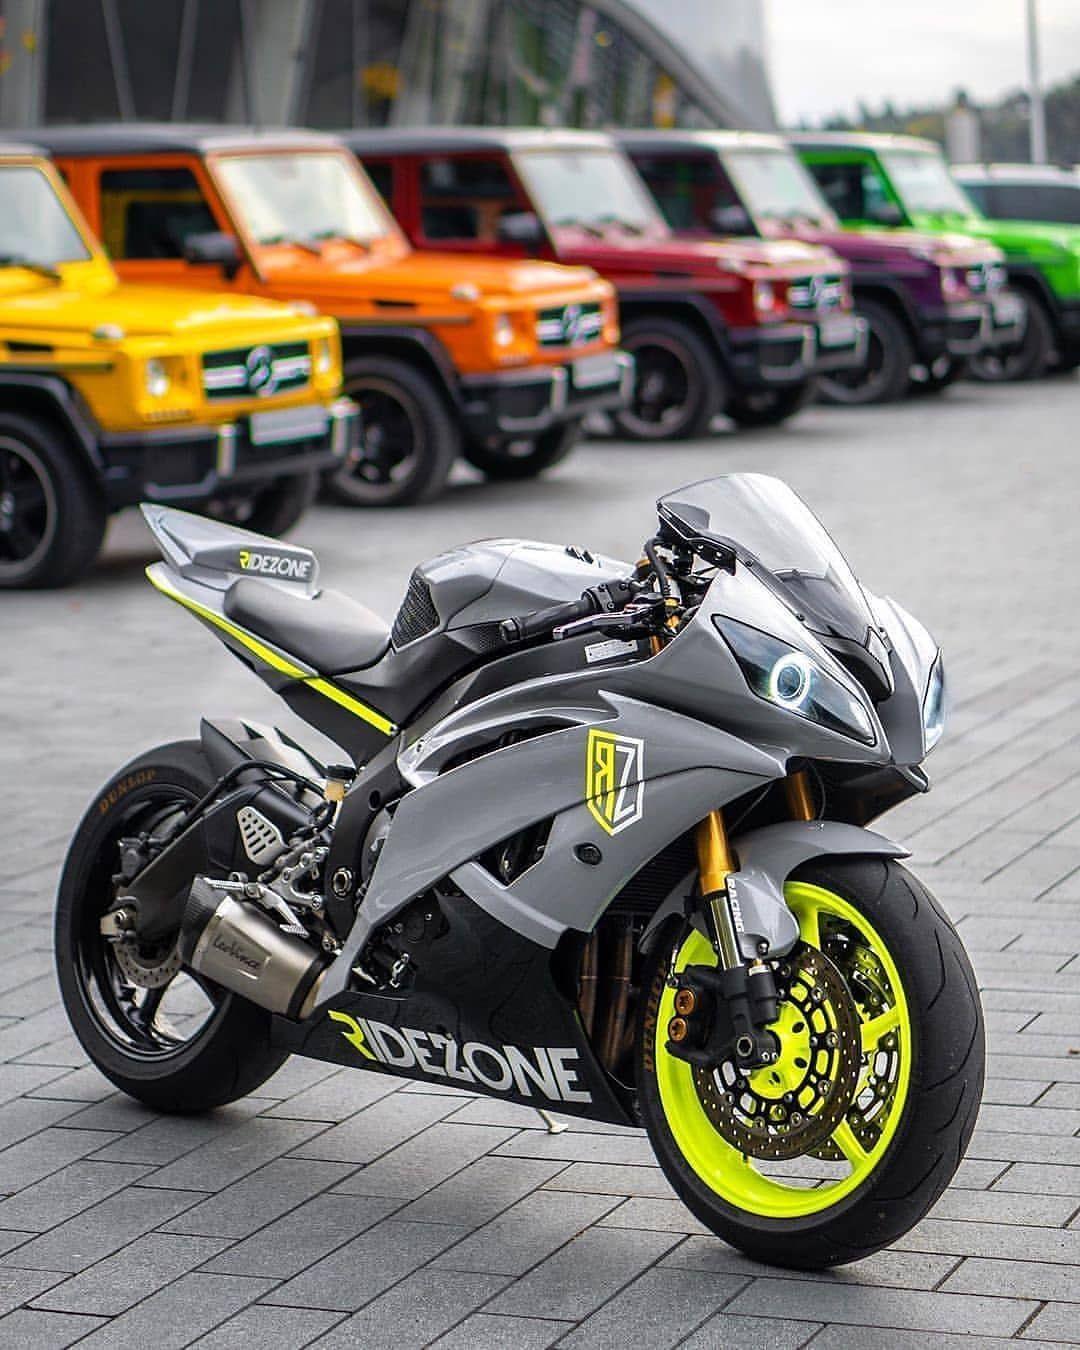 Bike Yamaha YZF R6 in 2020 Super bikes, Stunt bike